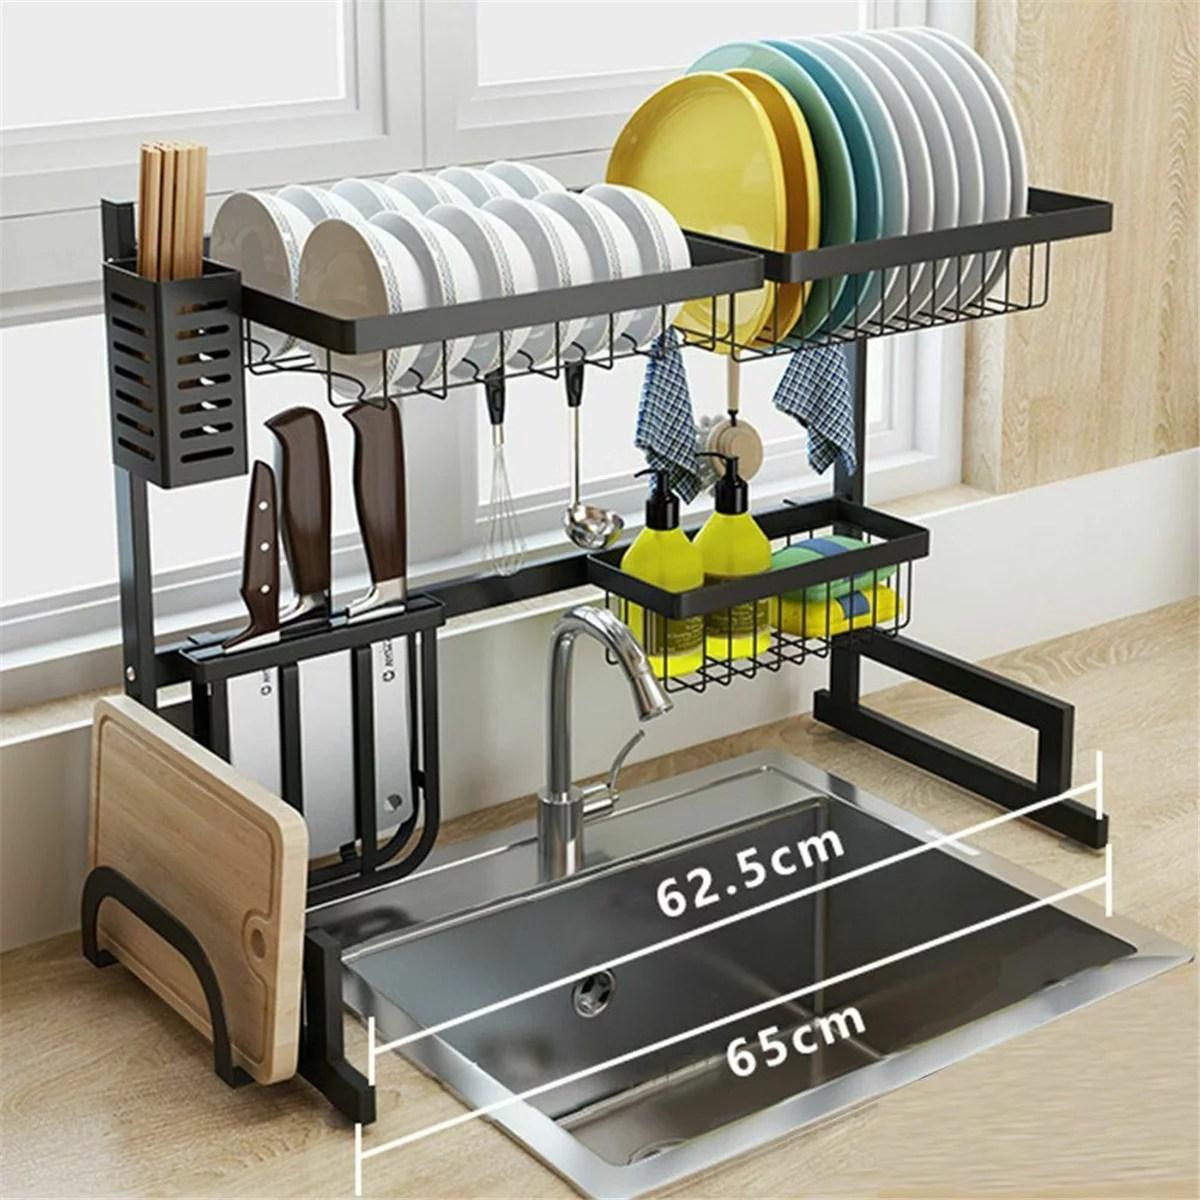 dish drying rack over sink rack stainless steel over the sink drainer shelf storage rack utensils holder display stand with utensil holder drain